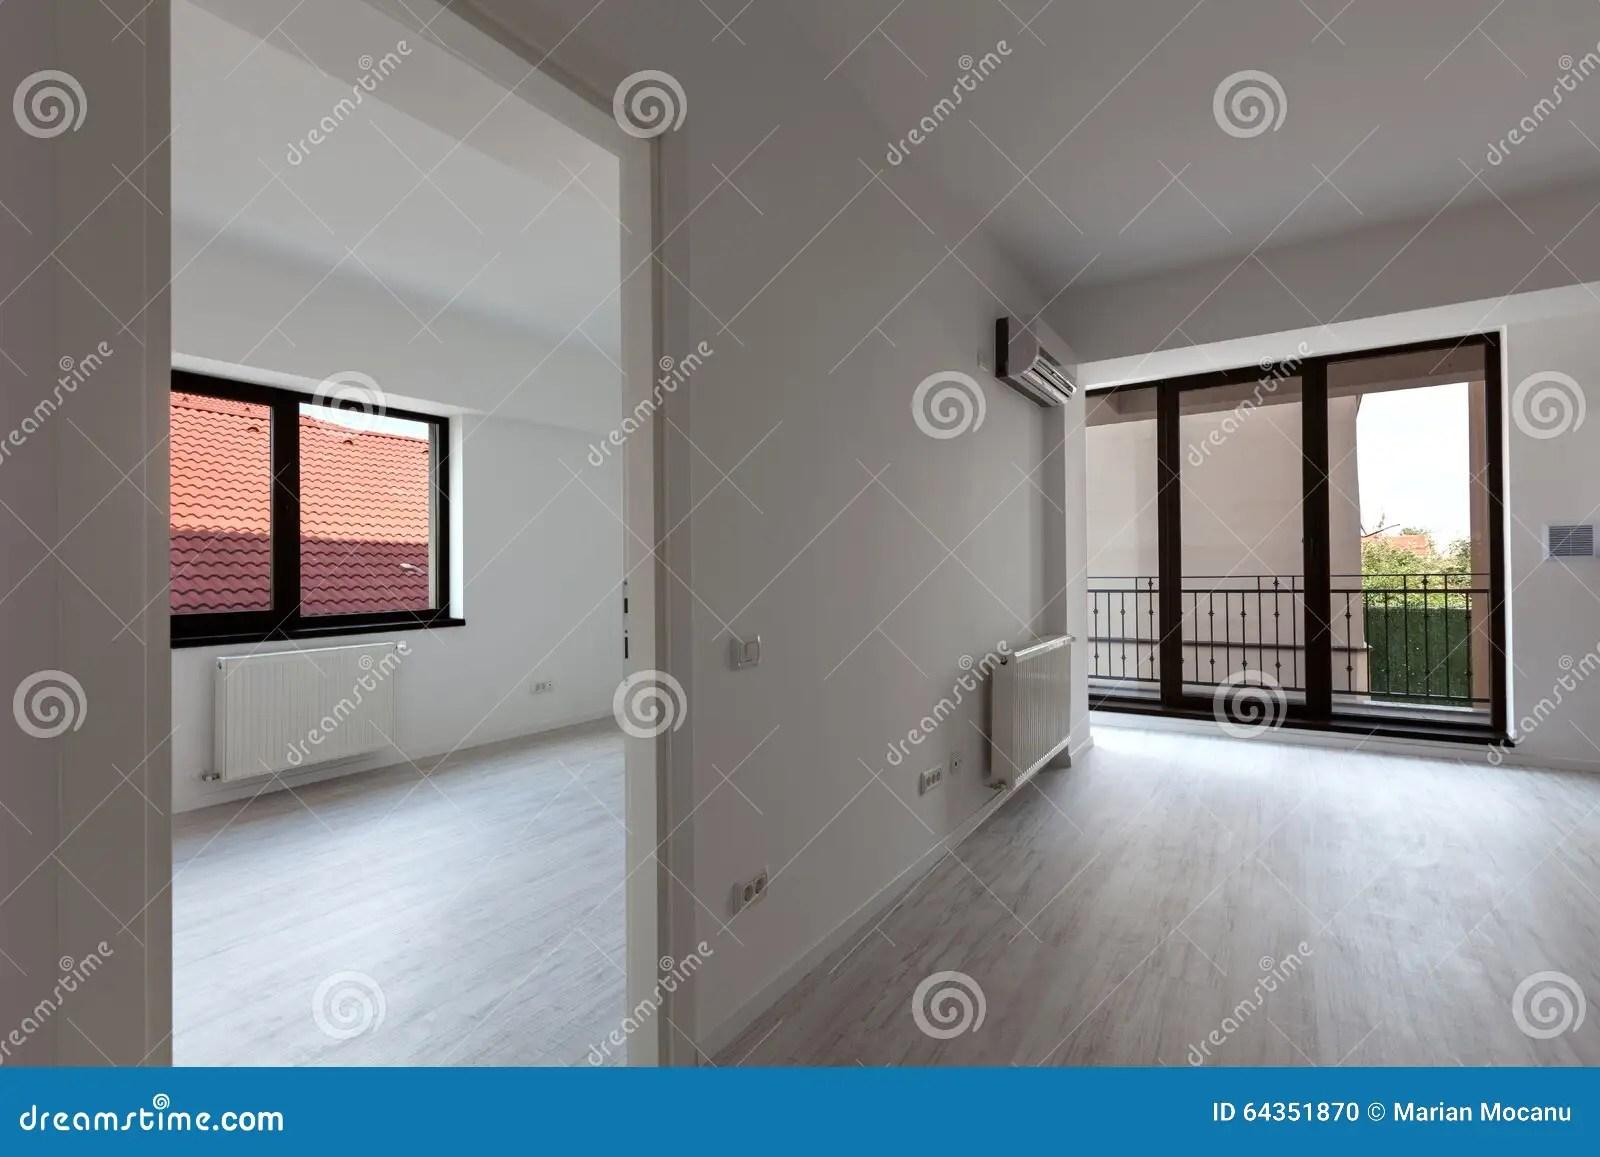 Empty apartment stock photo Image of relax bathroom  64351870